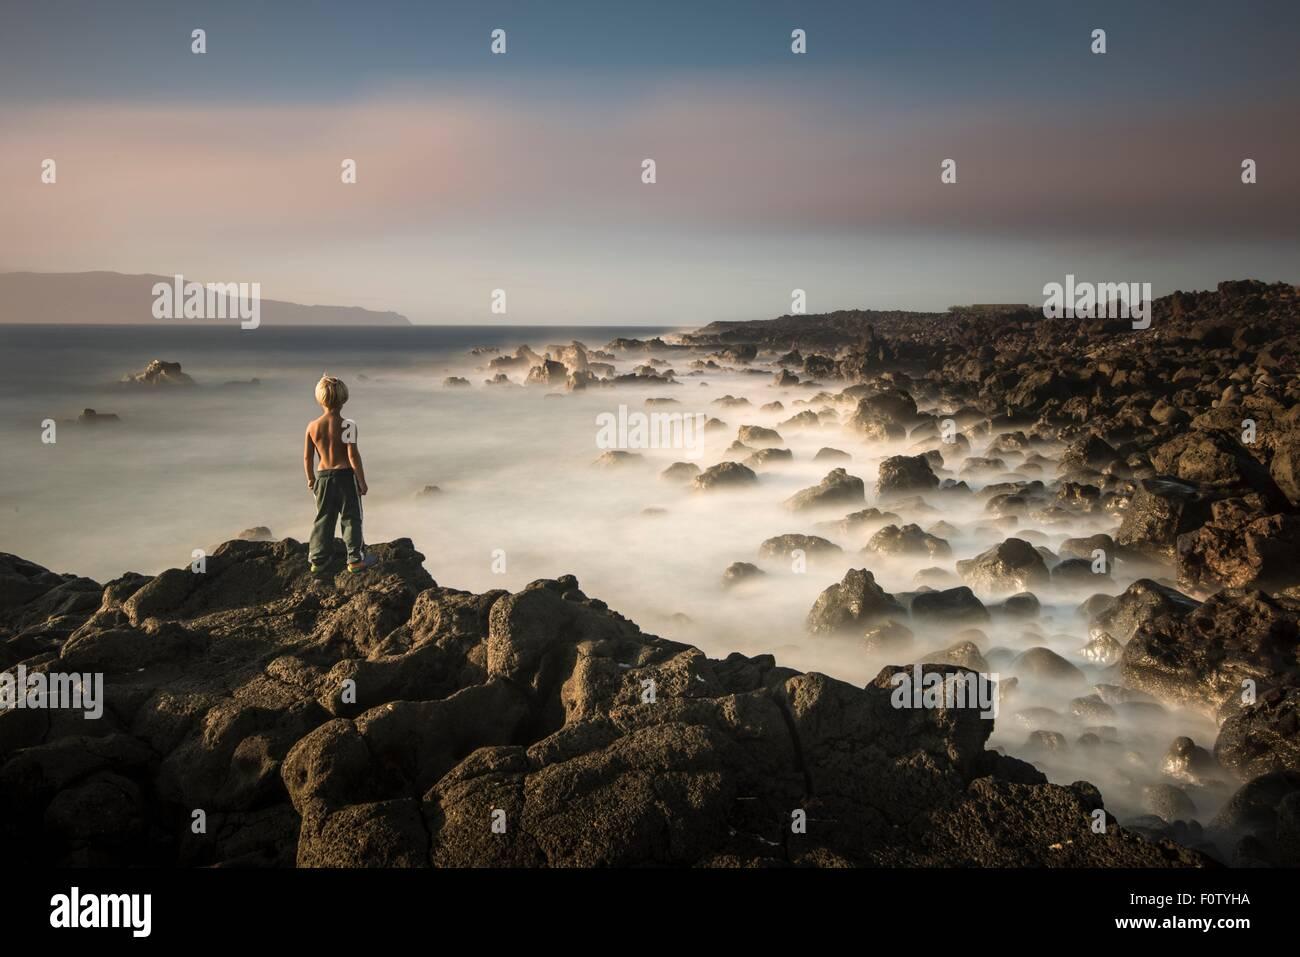 Boy on edge of cliff, Madalena, Pico, Azores, Portugal - Stock Image